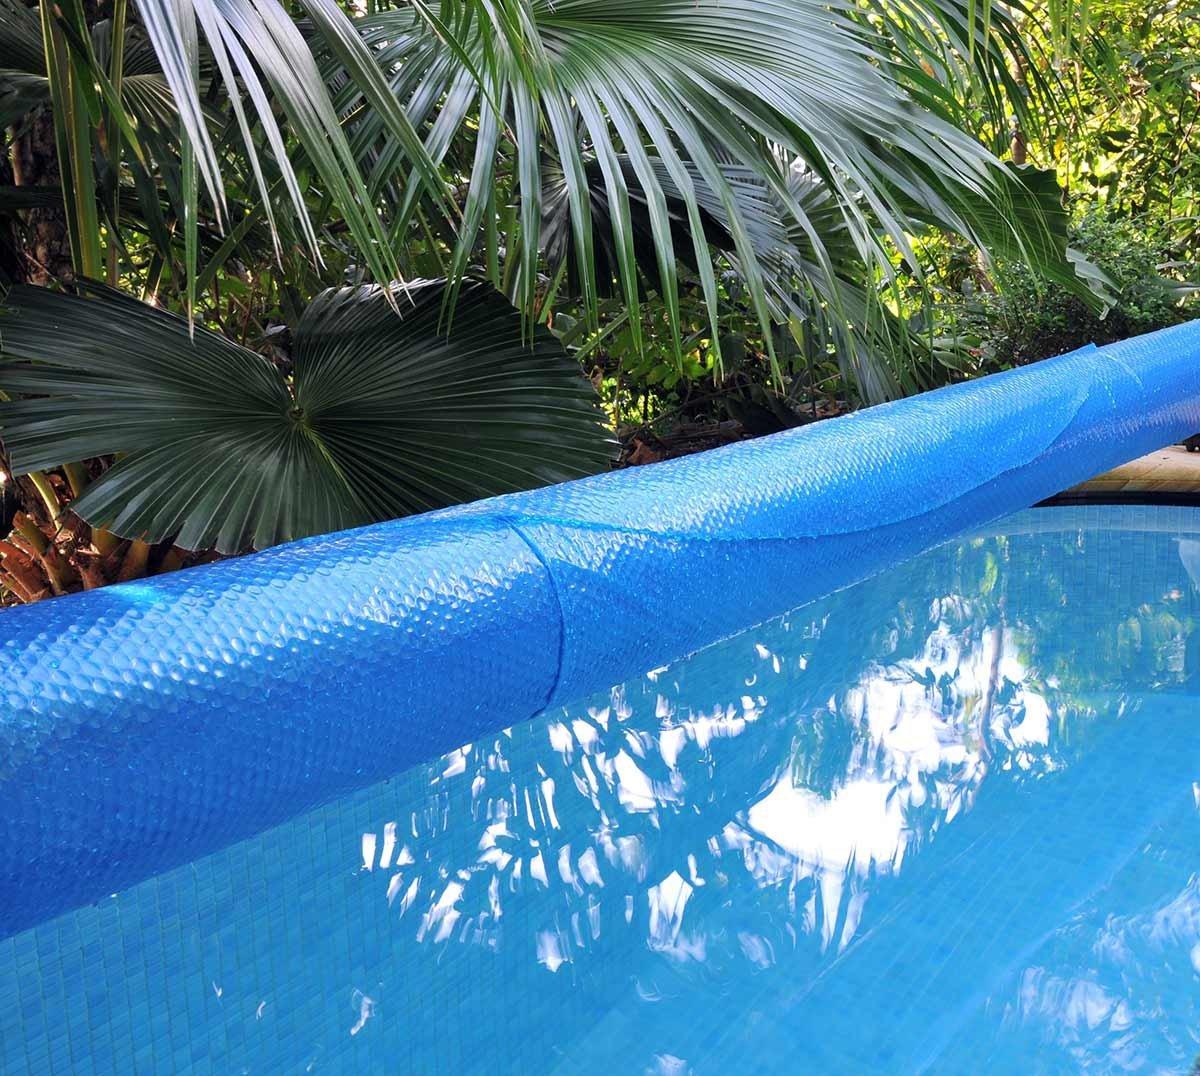 Cobertor solar de 8 x 4 m Kokido K861BX